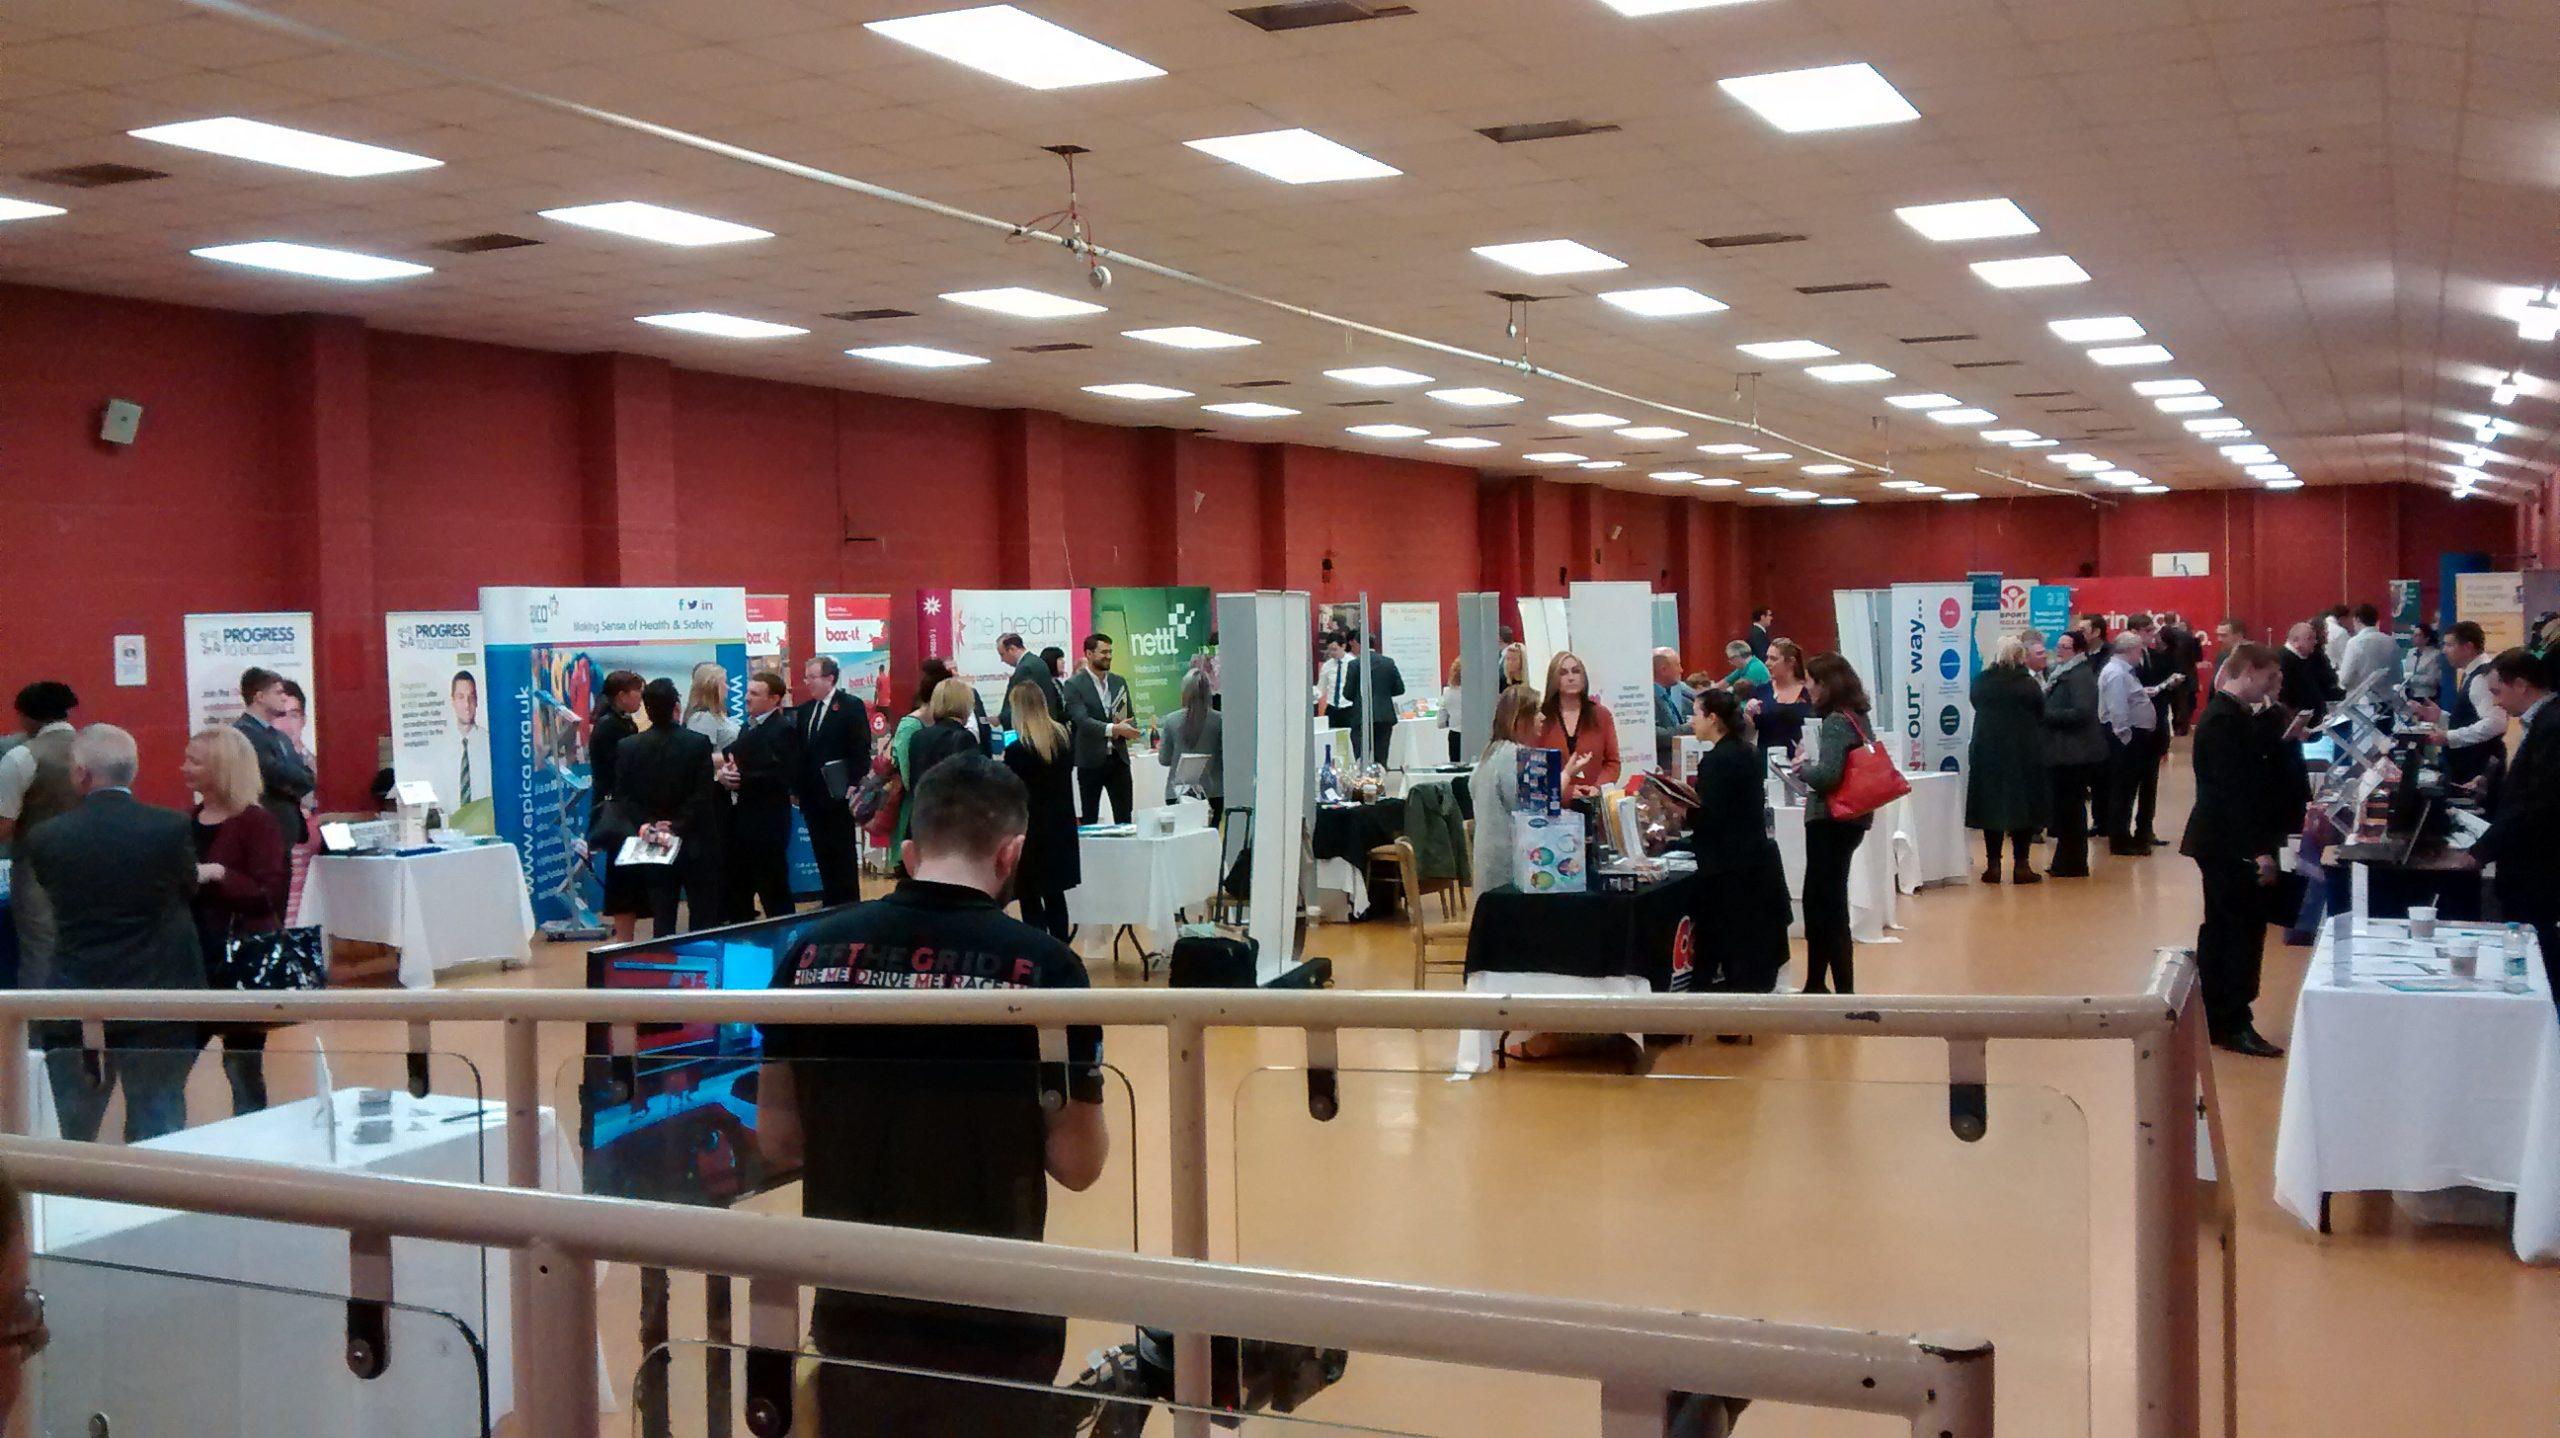 Halton-Biz-Fair-2015-Business-Exhibition